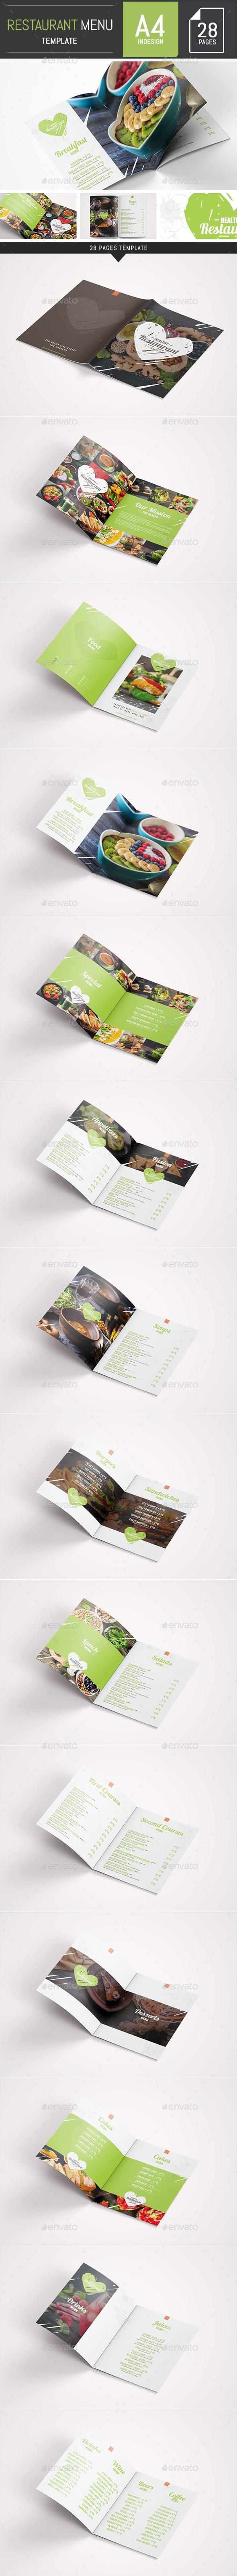 Elegant and Fresh Food / Restaurant Menu A4 Brochure Template - InDesign - Food Menus Print Templates